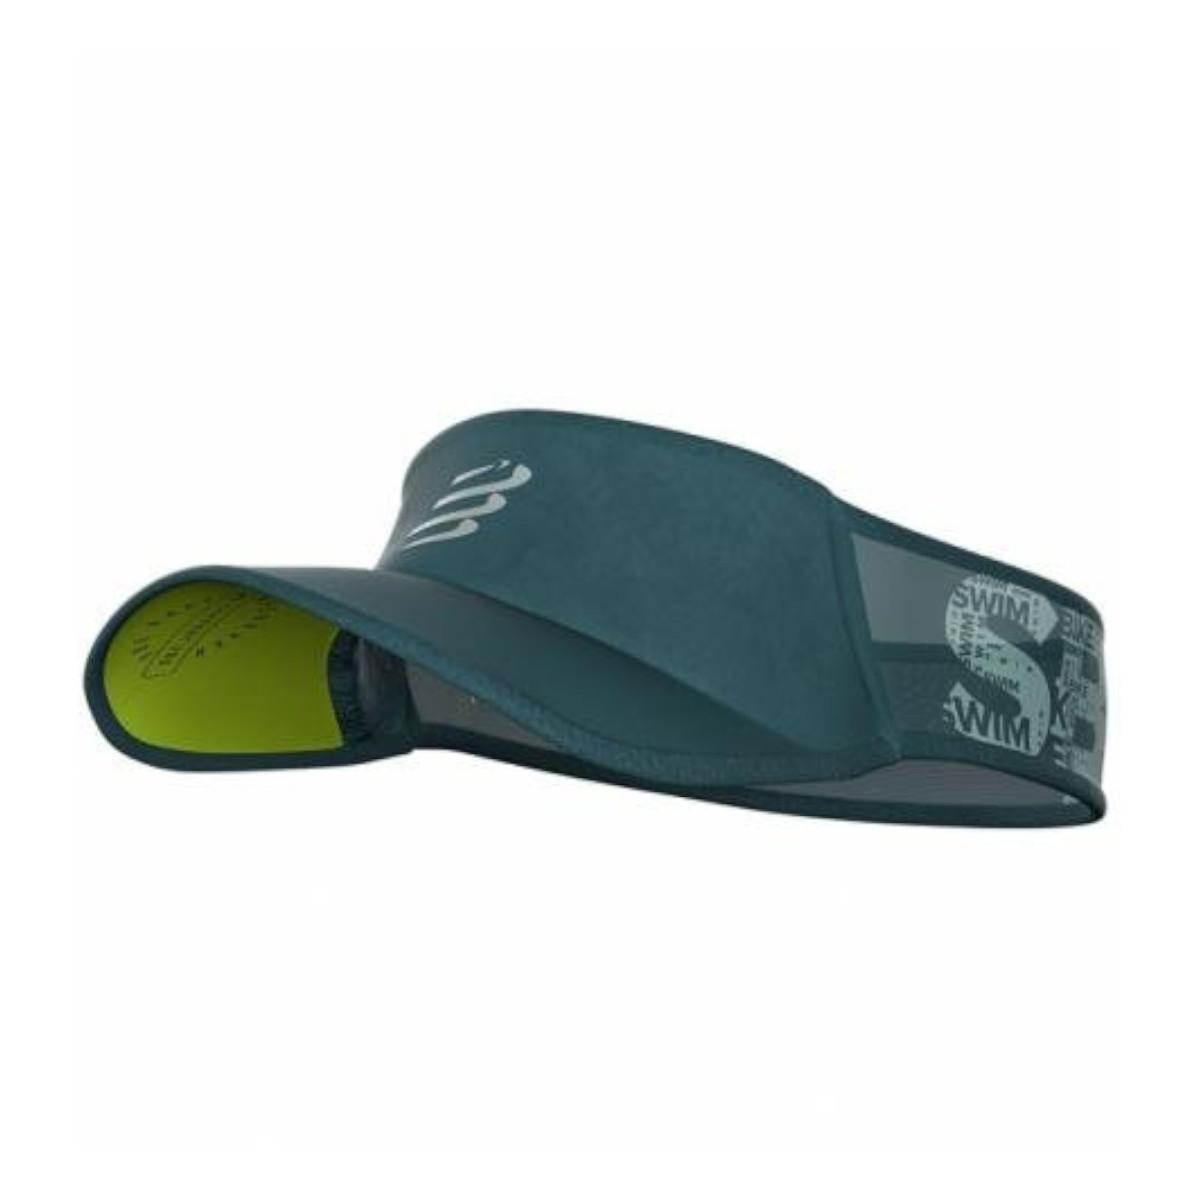 Viseira Compressport Ultralight Swim Bike Run Verde Cinza